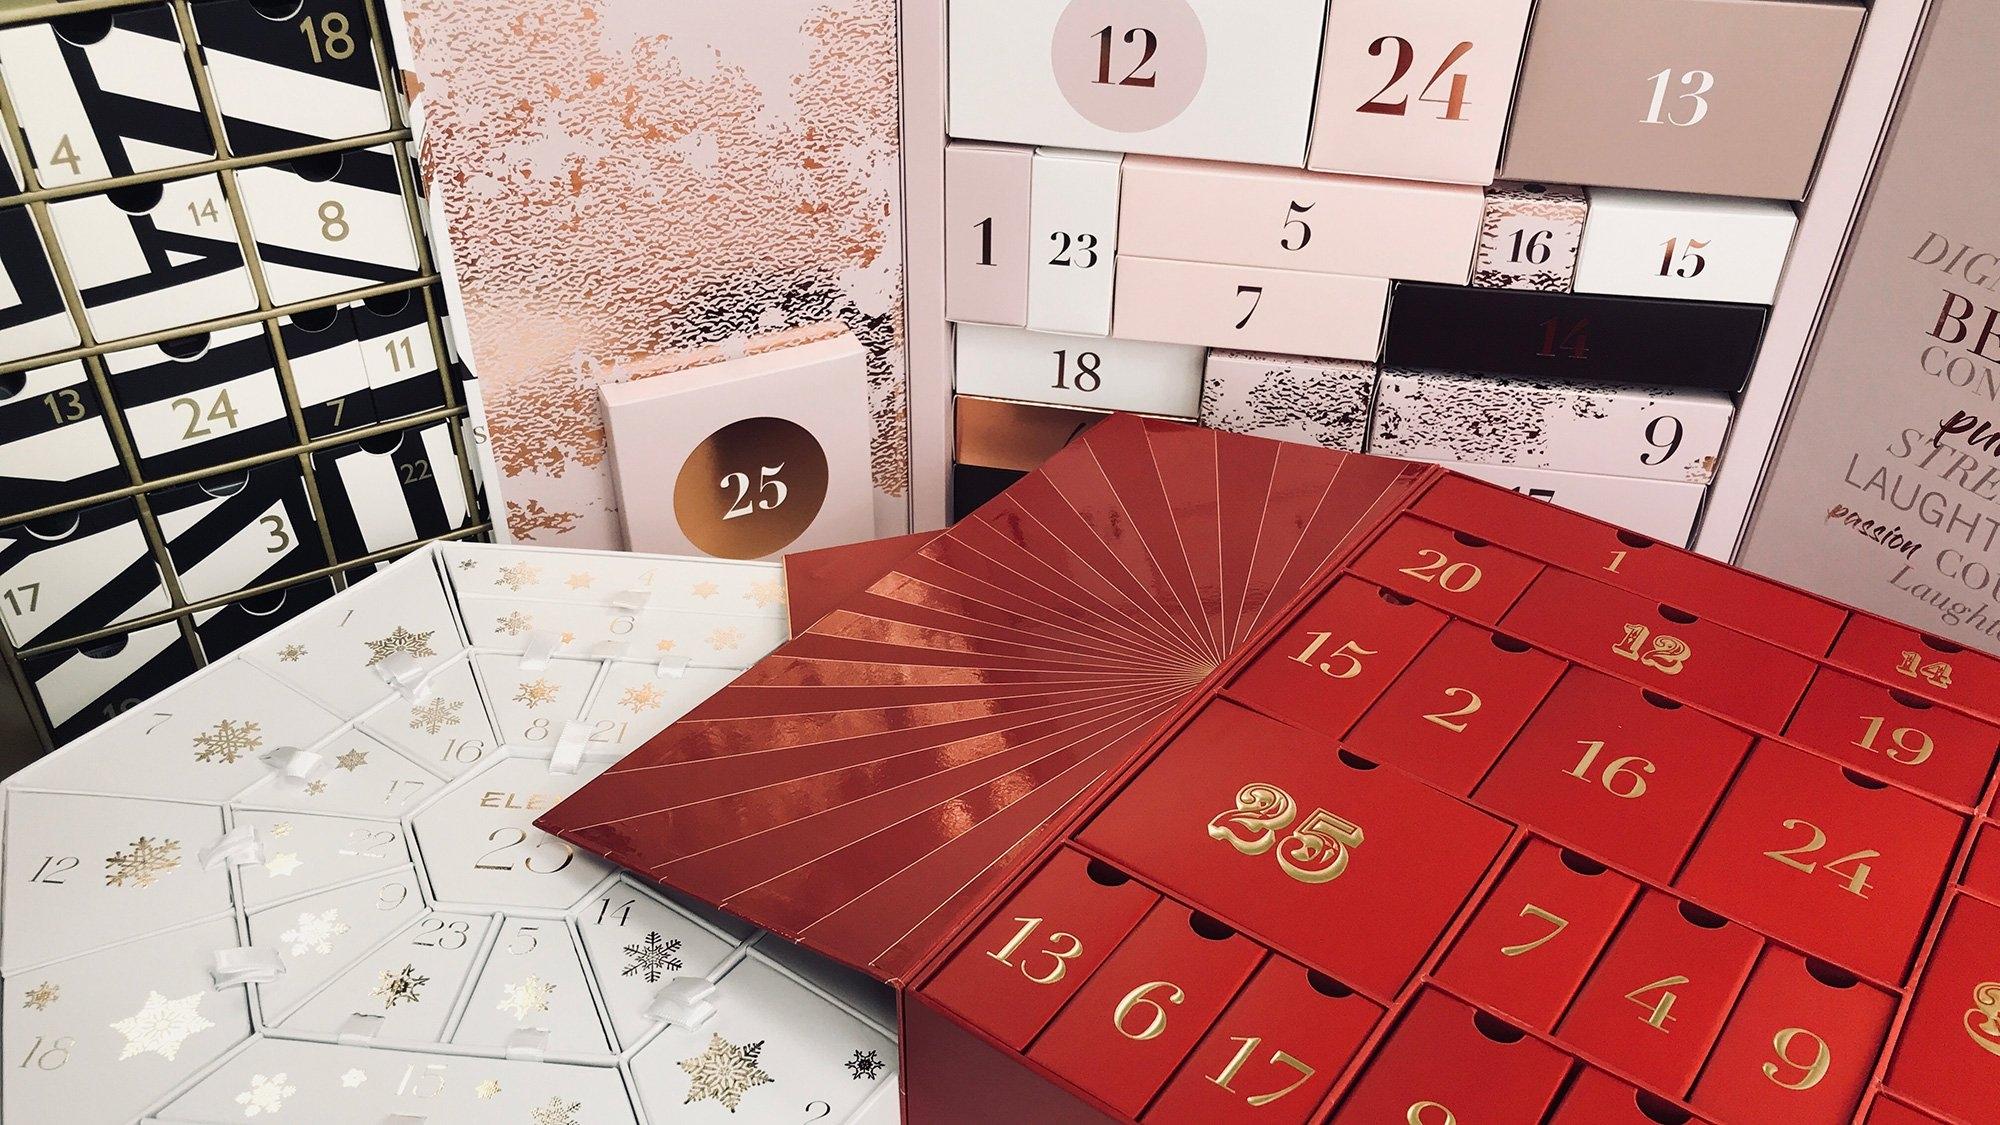 Beauty Advent Calendars On Sale: Bag A Bargain Before 2019 M&s Calendar 2019